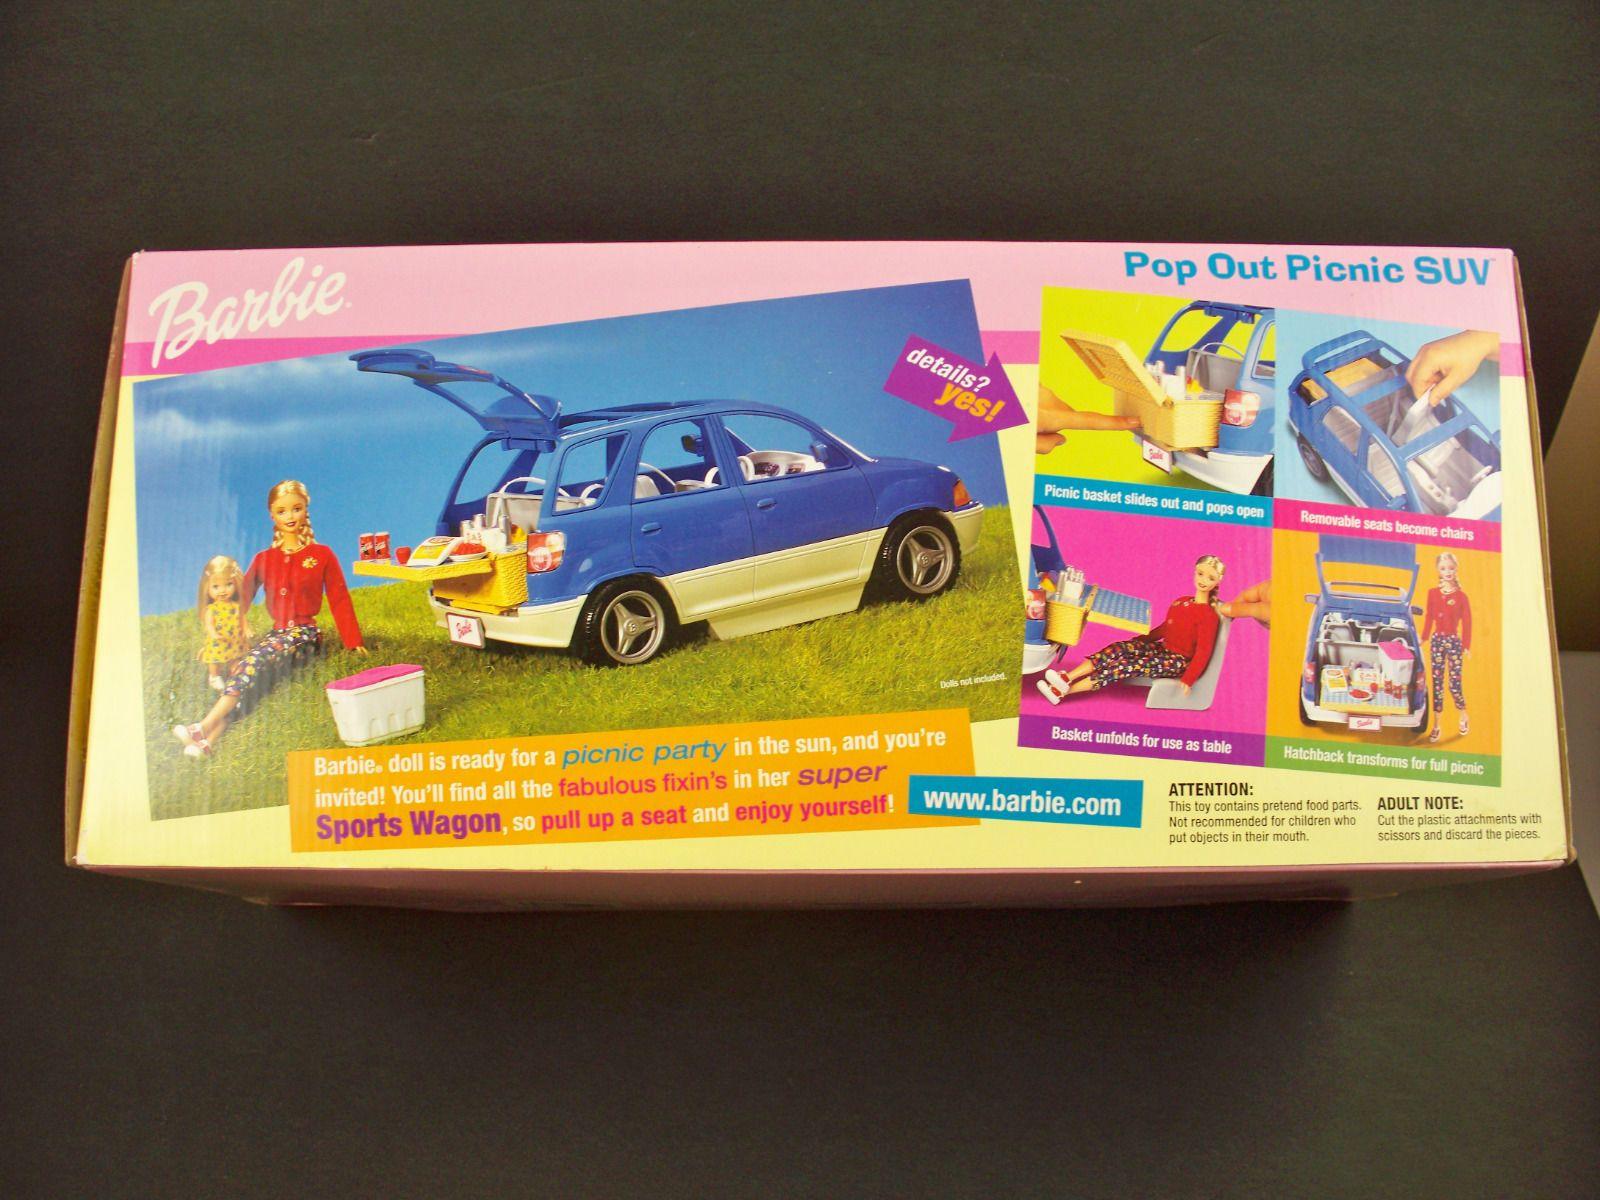 Nib Barbie Doll 1989 Pop Out Picnic Camping Suv Hatchback Car Van W Accessories Hatchback Cars Barbie Barbie Dolls [ 1200 x 1600 Pixel ]